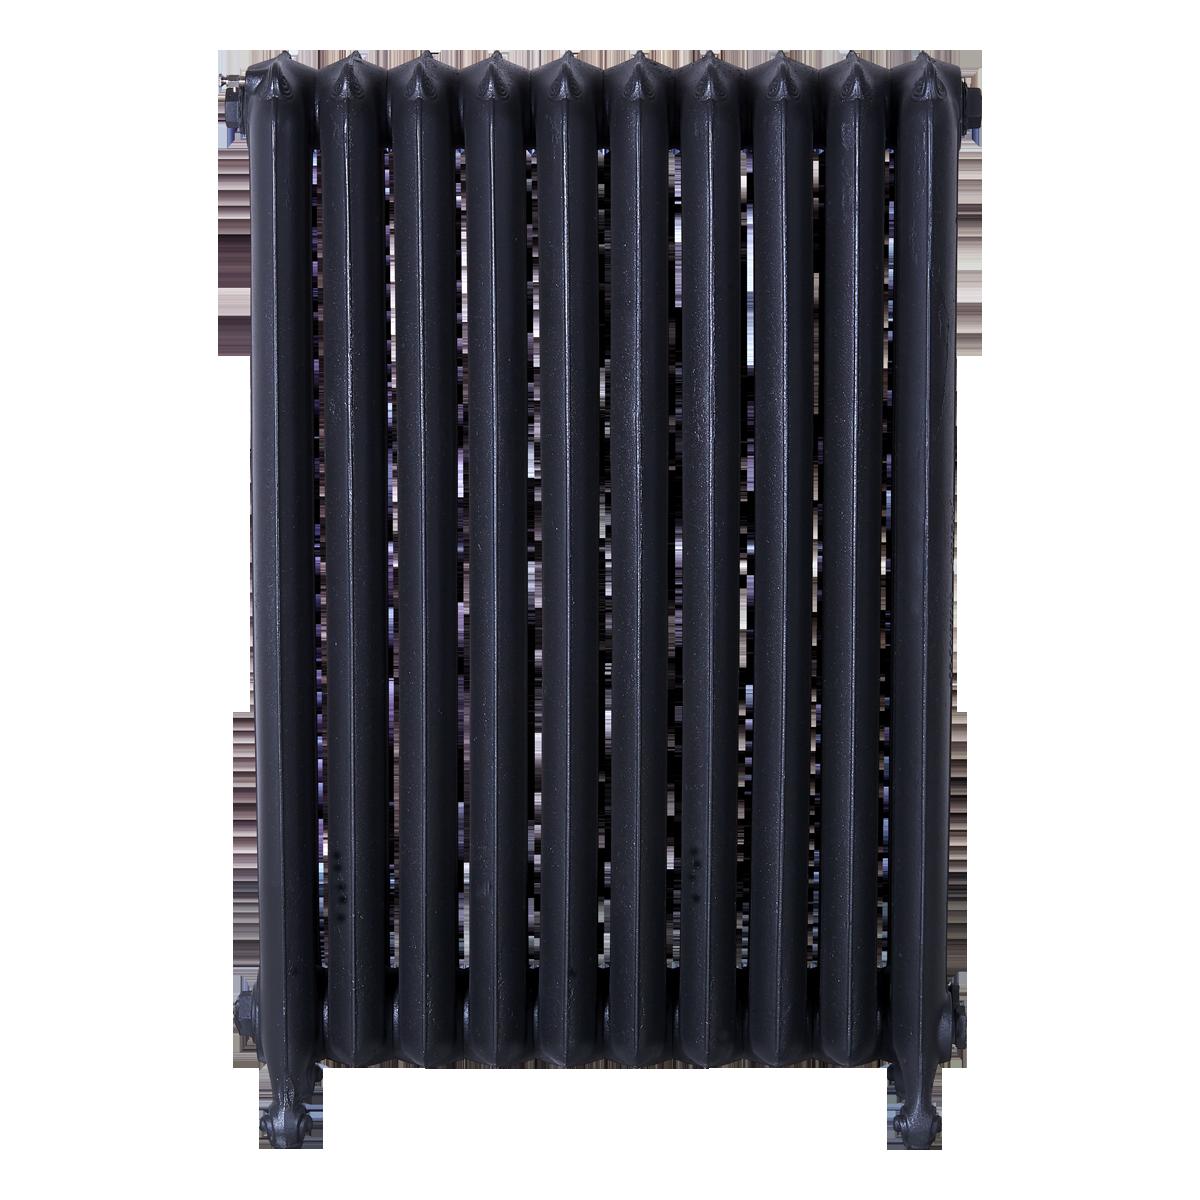 Ironworks Radiators Inc. refurbished cast iron radiator Princess Anne in Black